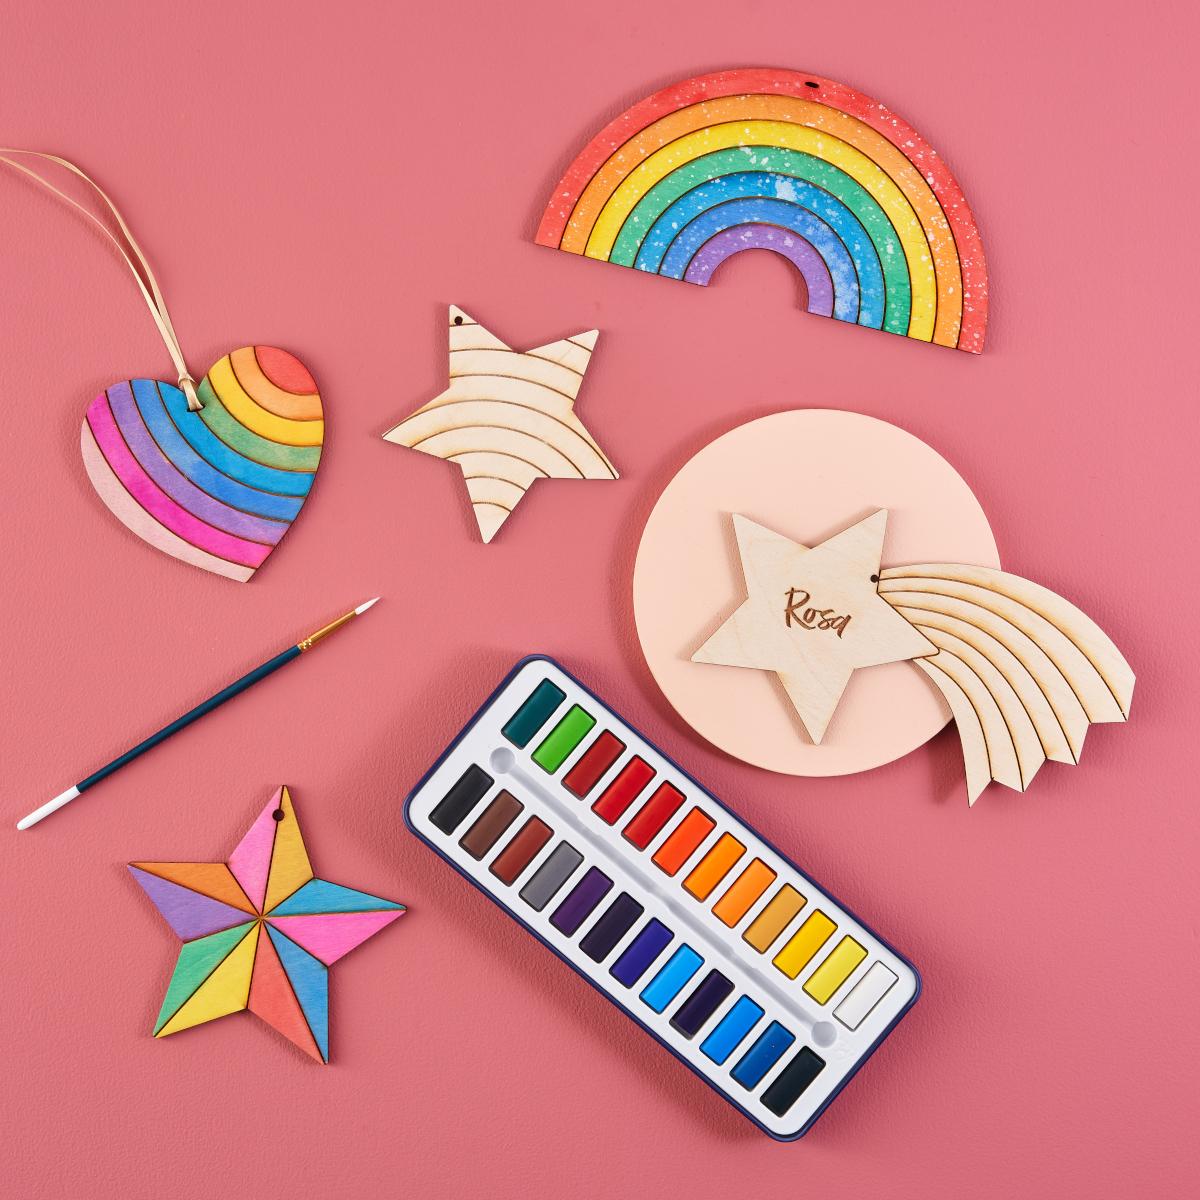 colourful craft kit for children